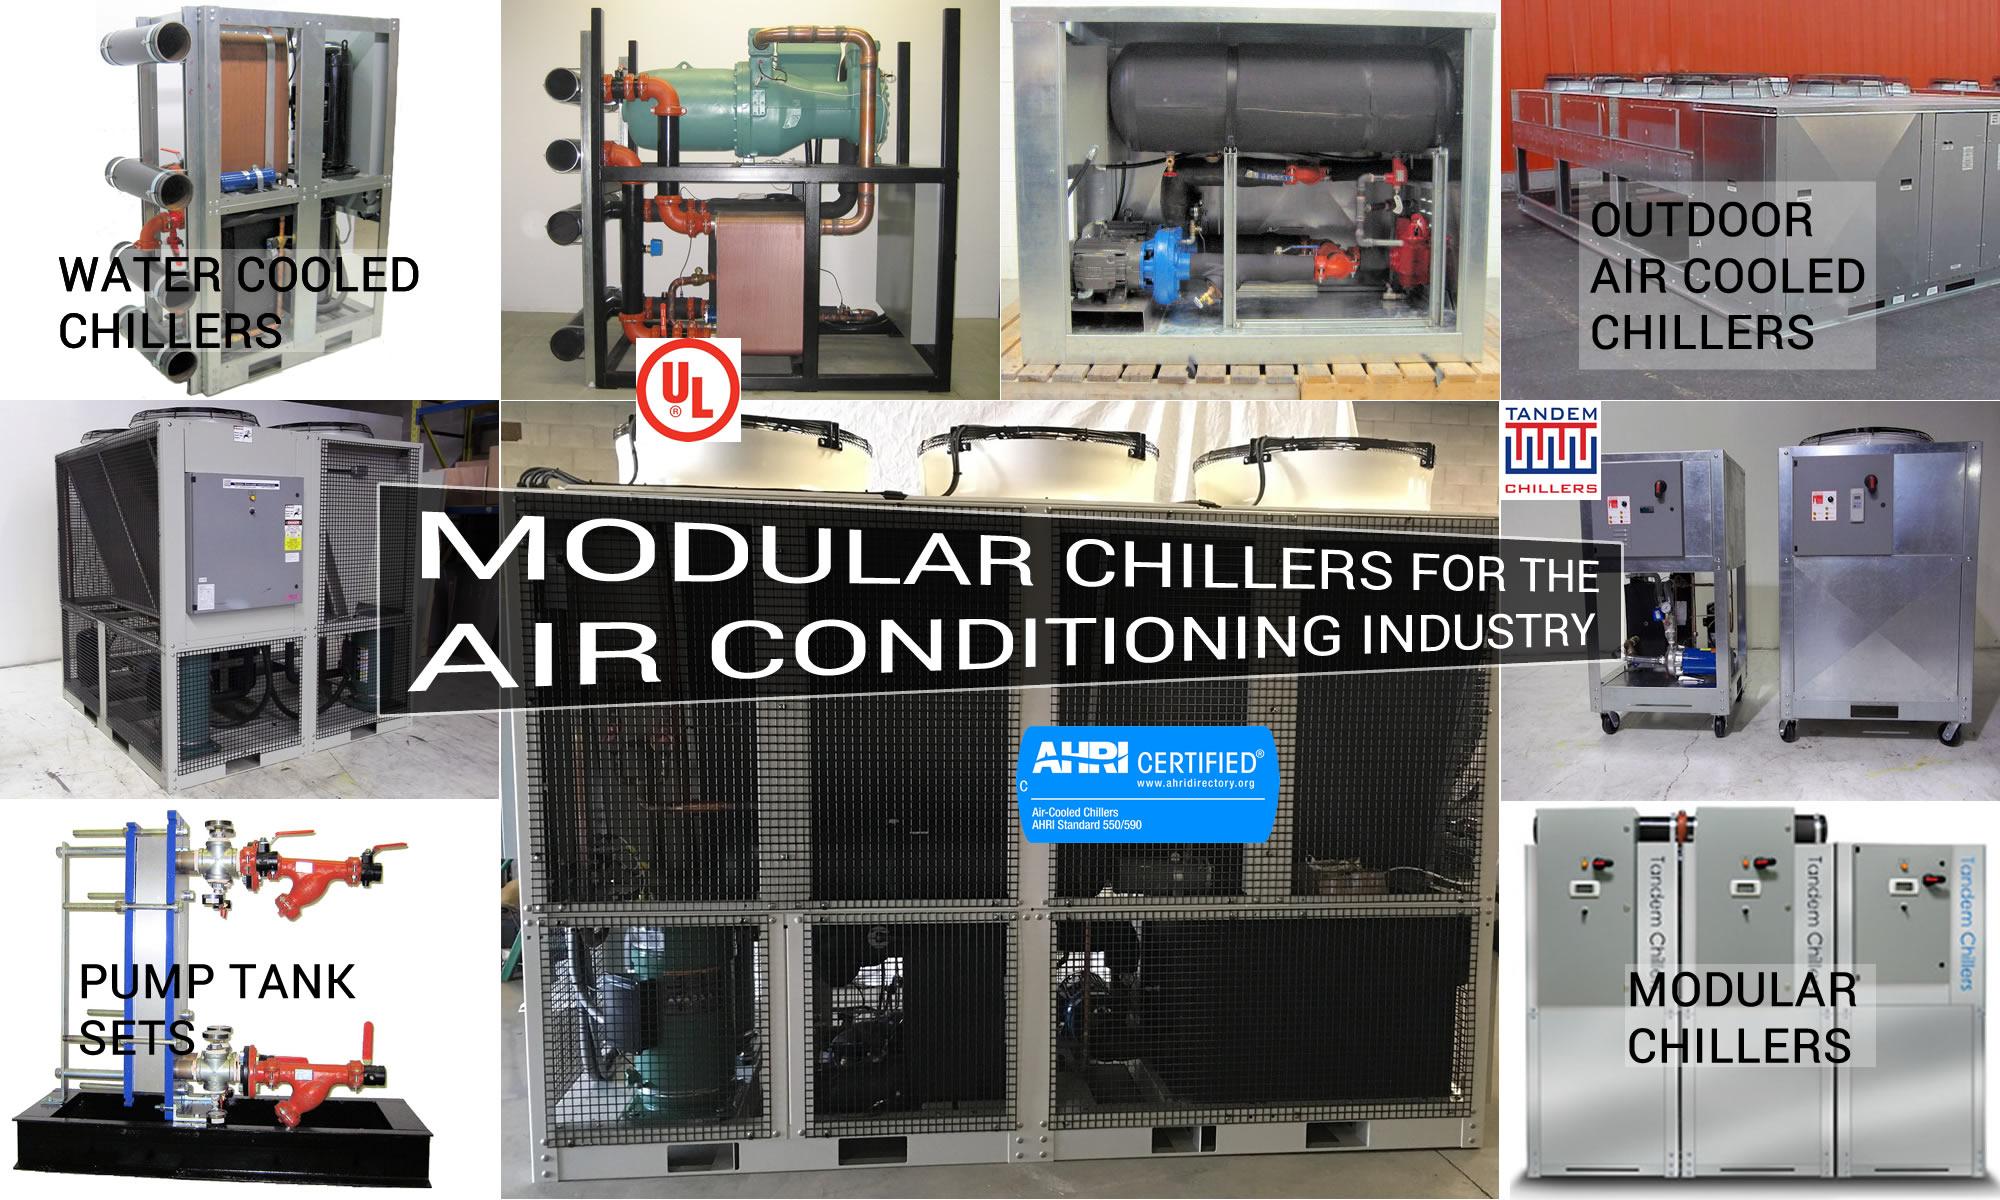 Modular Chillers